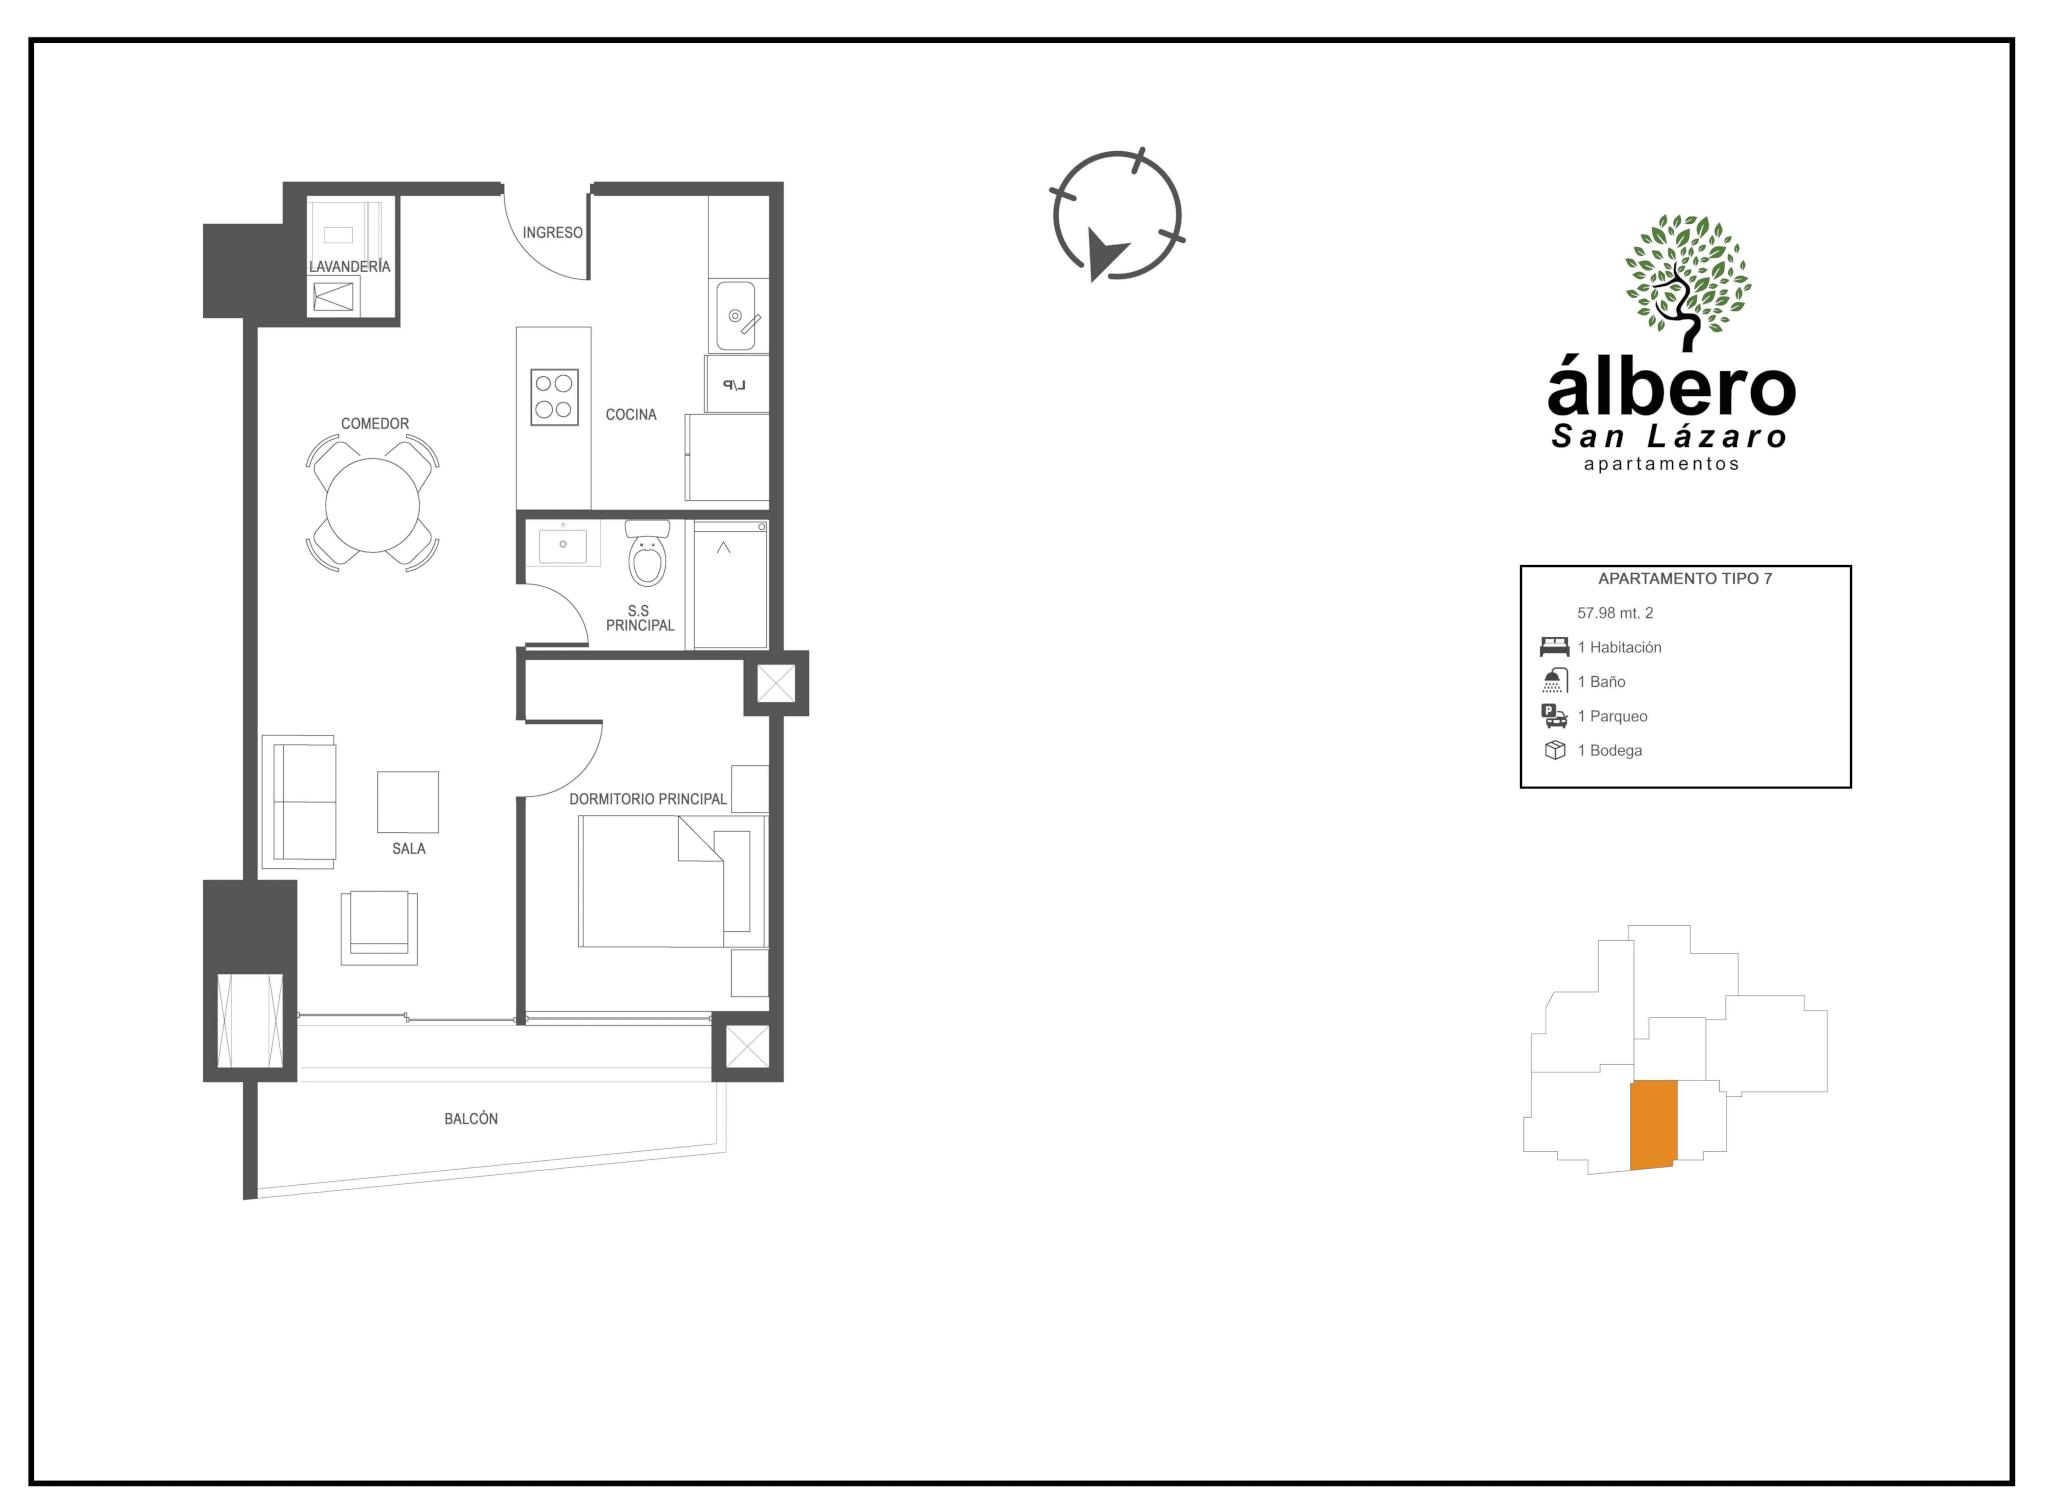 apartamento tipo 7